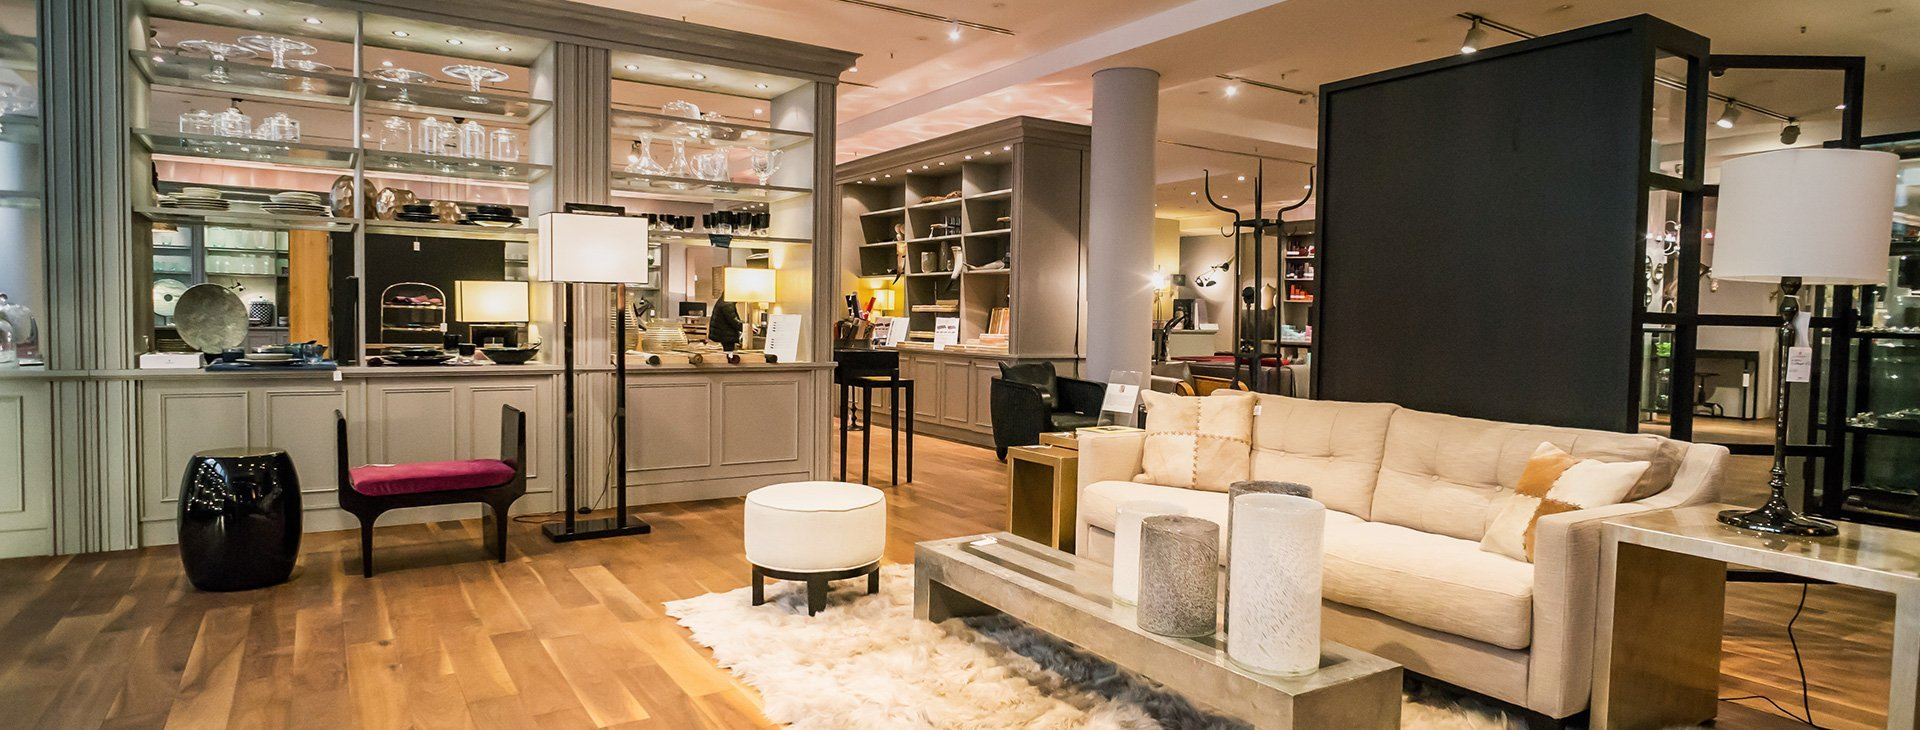 lambert ihre stores im stilwerk berlin. Black Bedroom Furniture Sets. Home Design Ideas